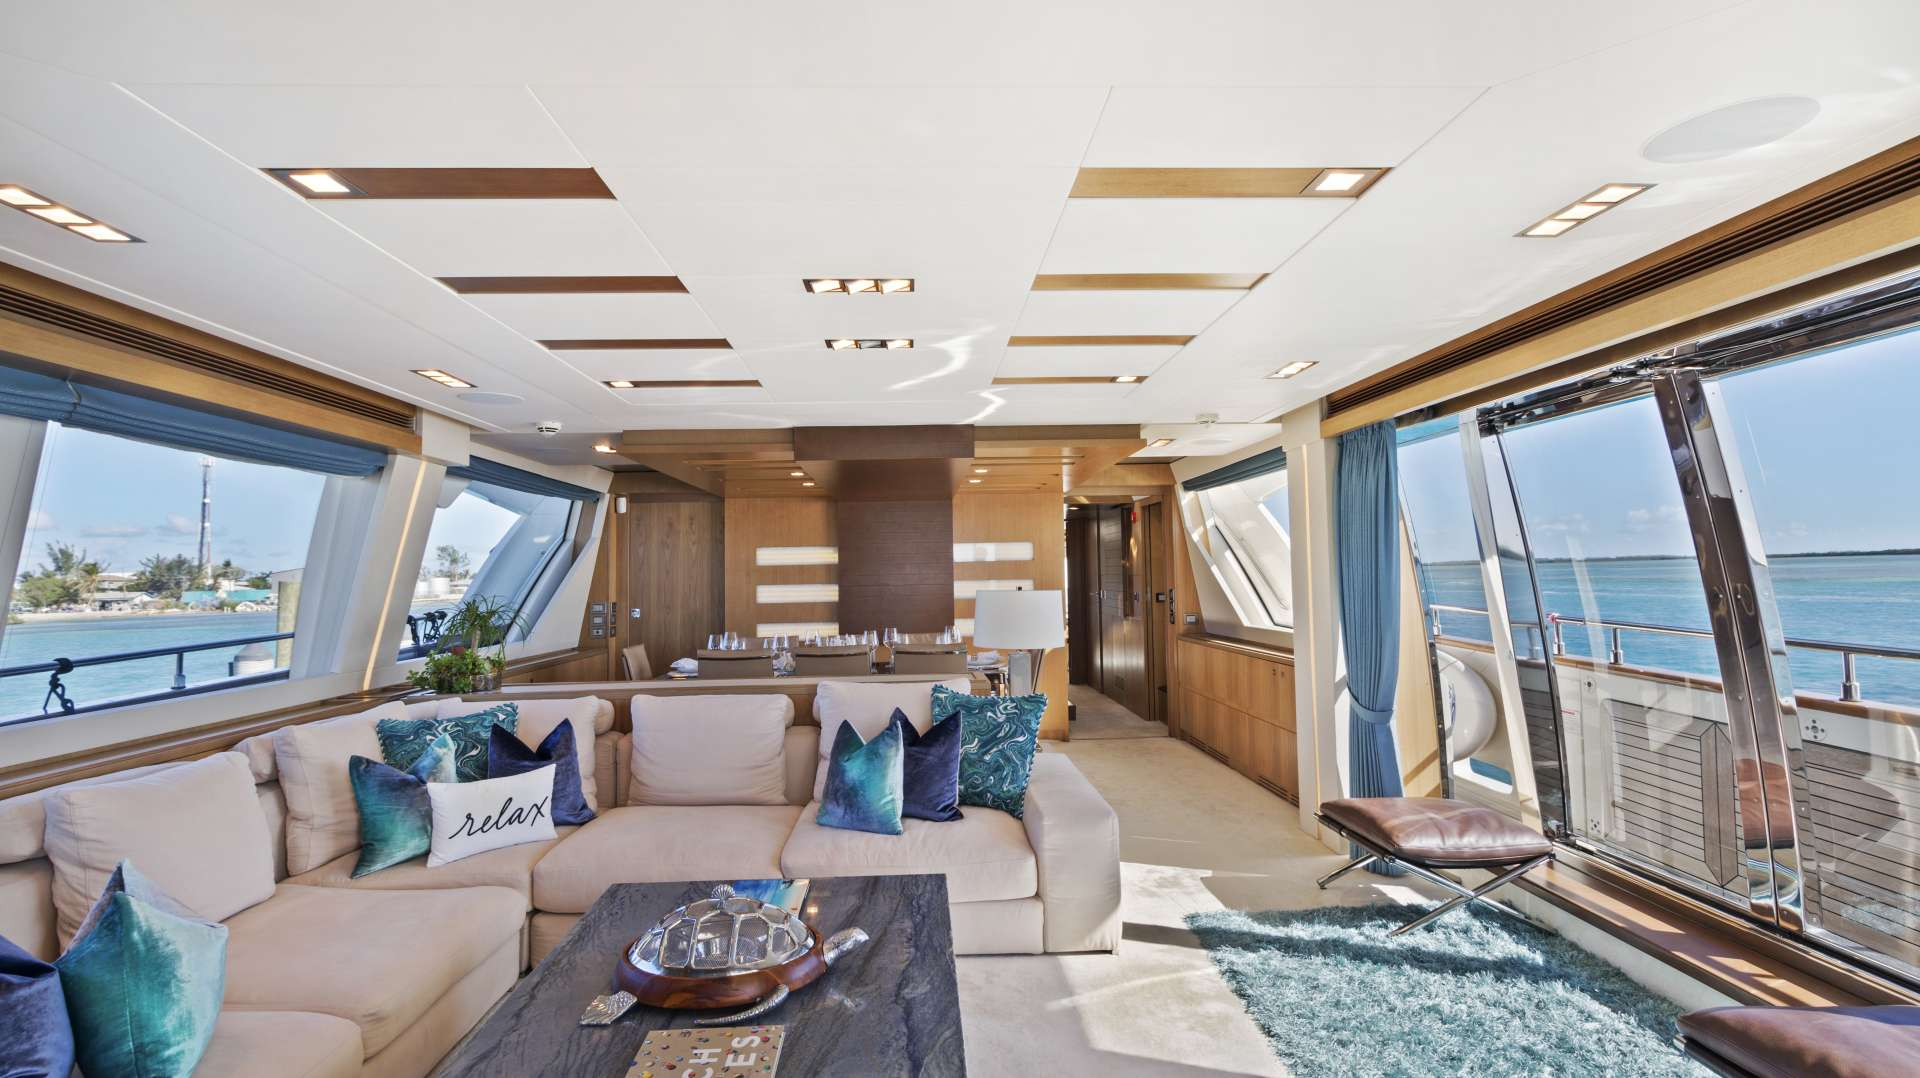 Power Yacht 'Power', 10 PAX, 5 Crew, 100.00 Ft, 30.00 Meters, Built 2012, Ferretti, Refit Year 2017